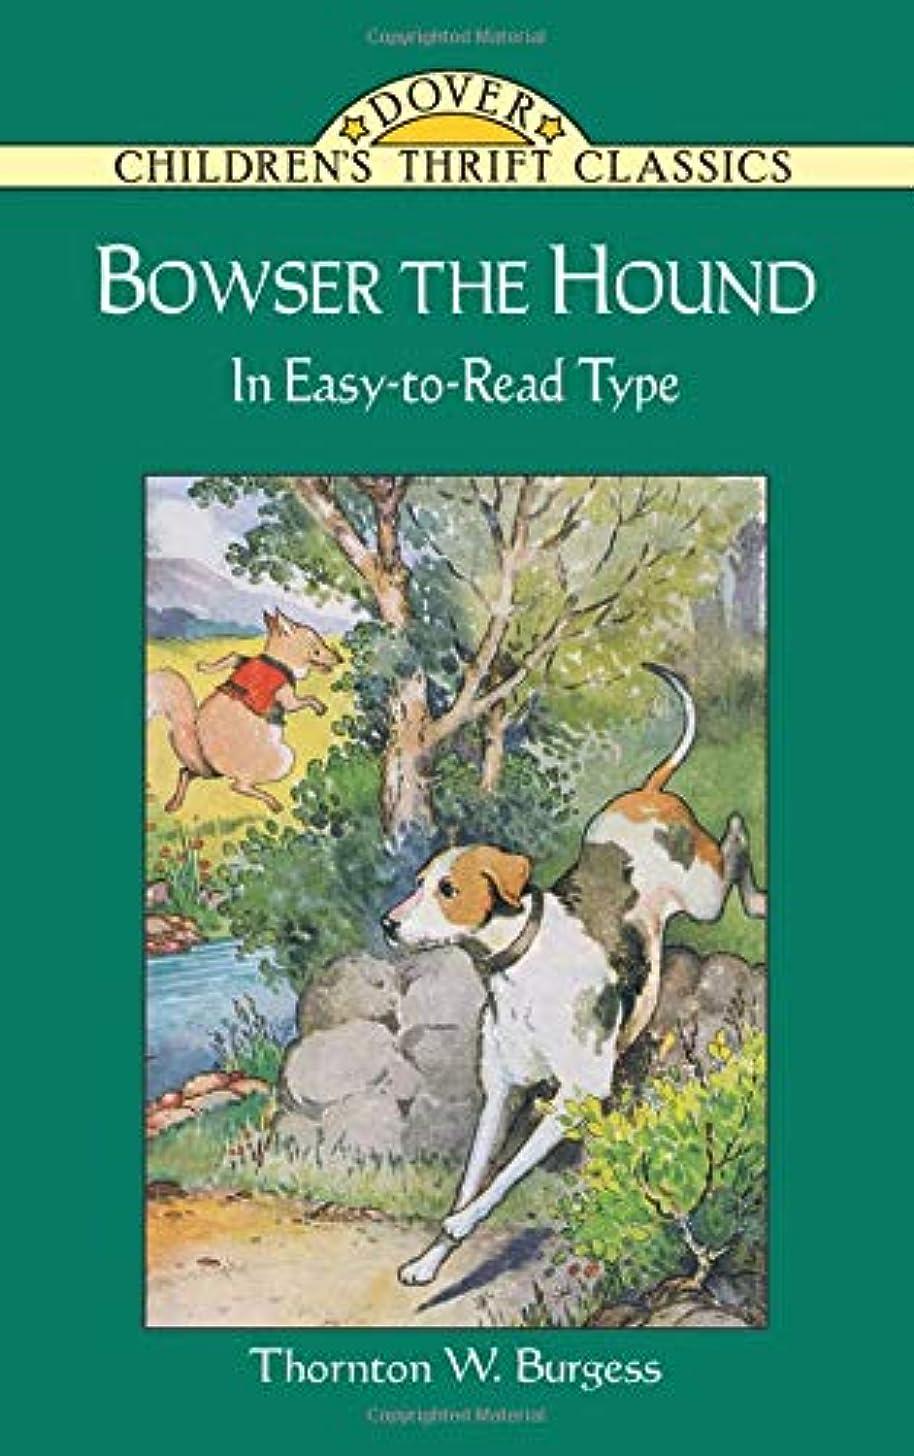 Bowser the Hound (Dover Children's Thrift Classics)